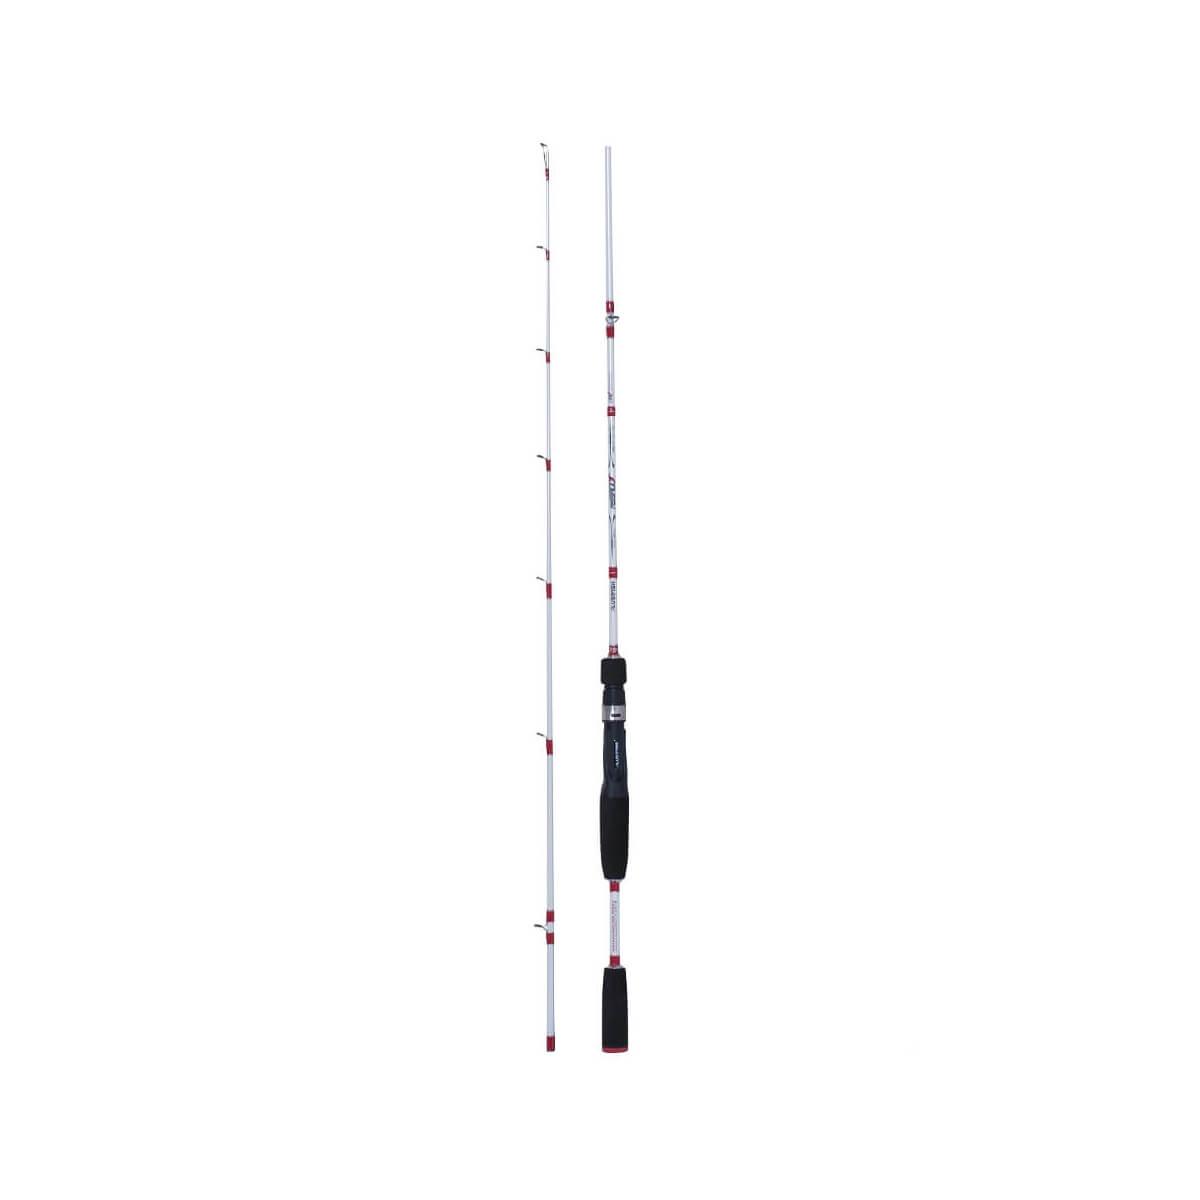 Vara Plusfish Assault 1,68m 10-20lb Carretilha 2 Partes